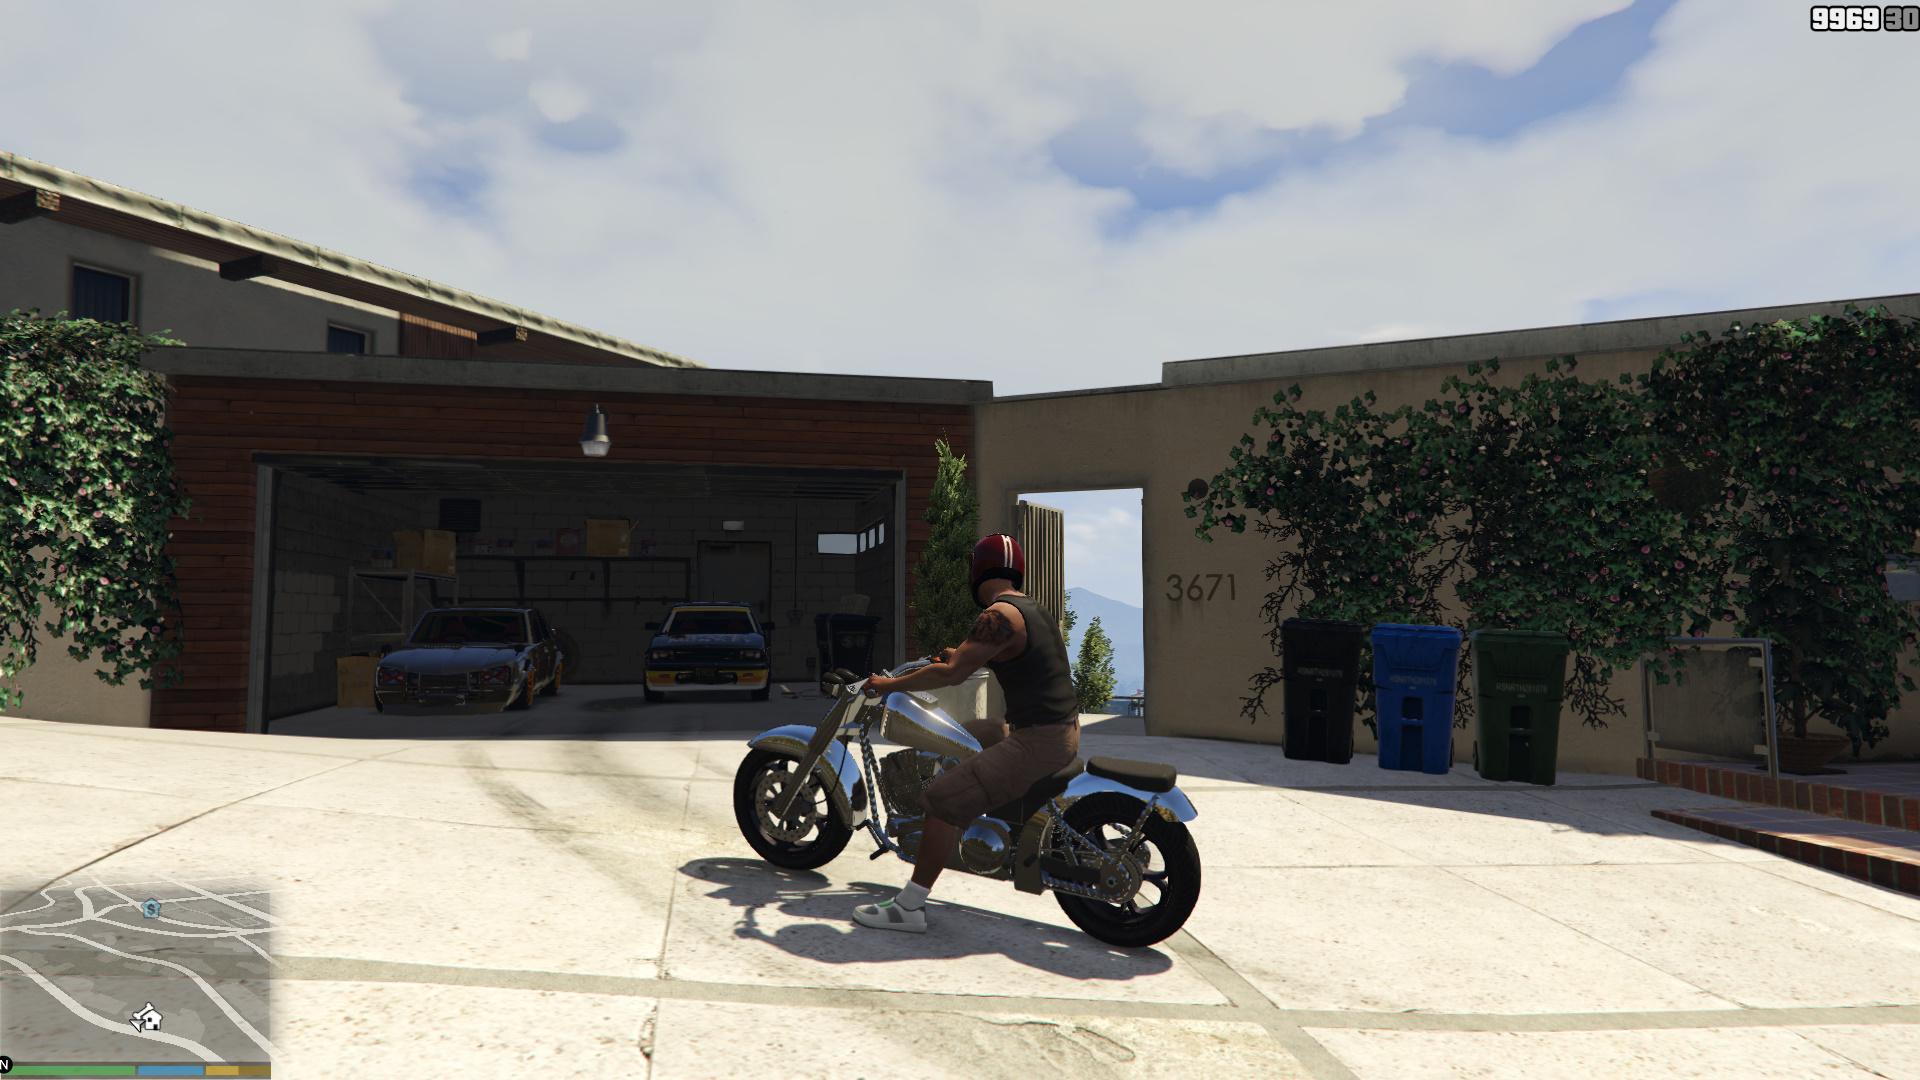 GTA5 2017-06-09 22-50-53-348.jpg - Grand Theft Auto 5